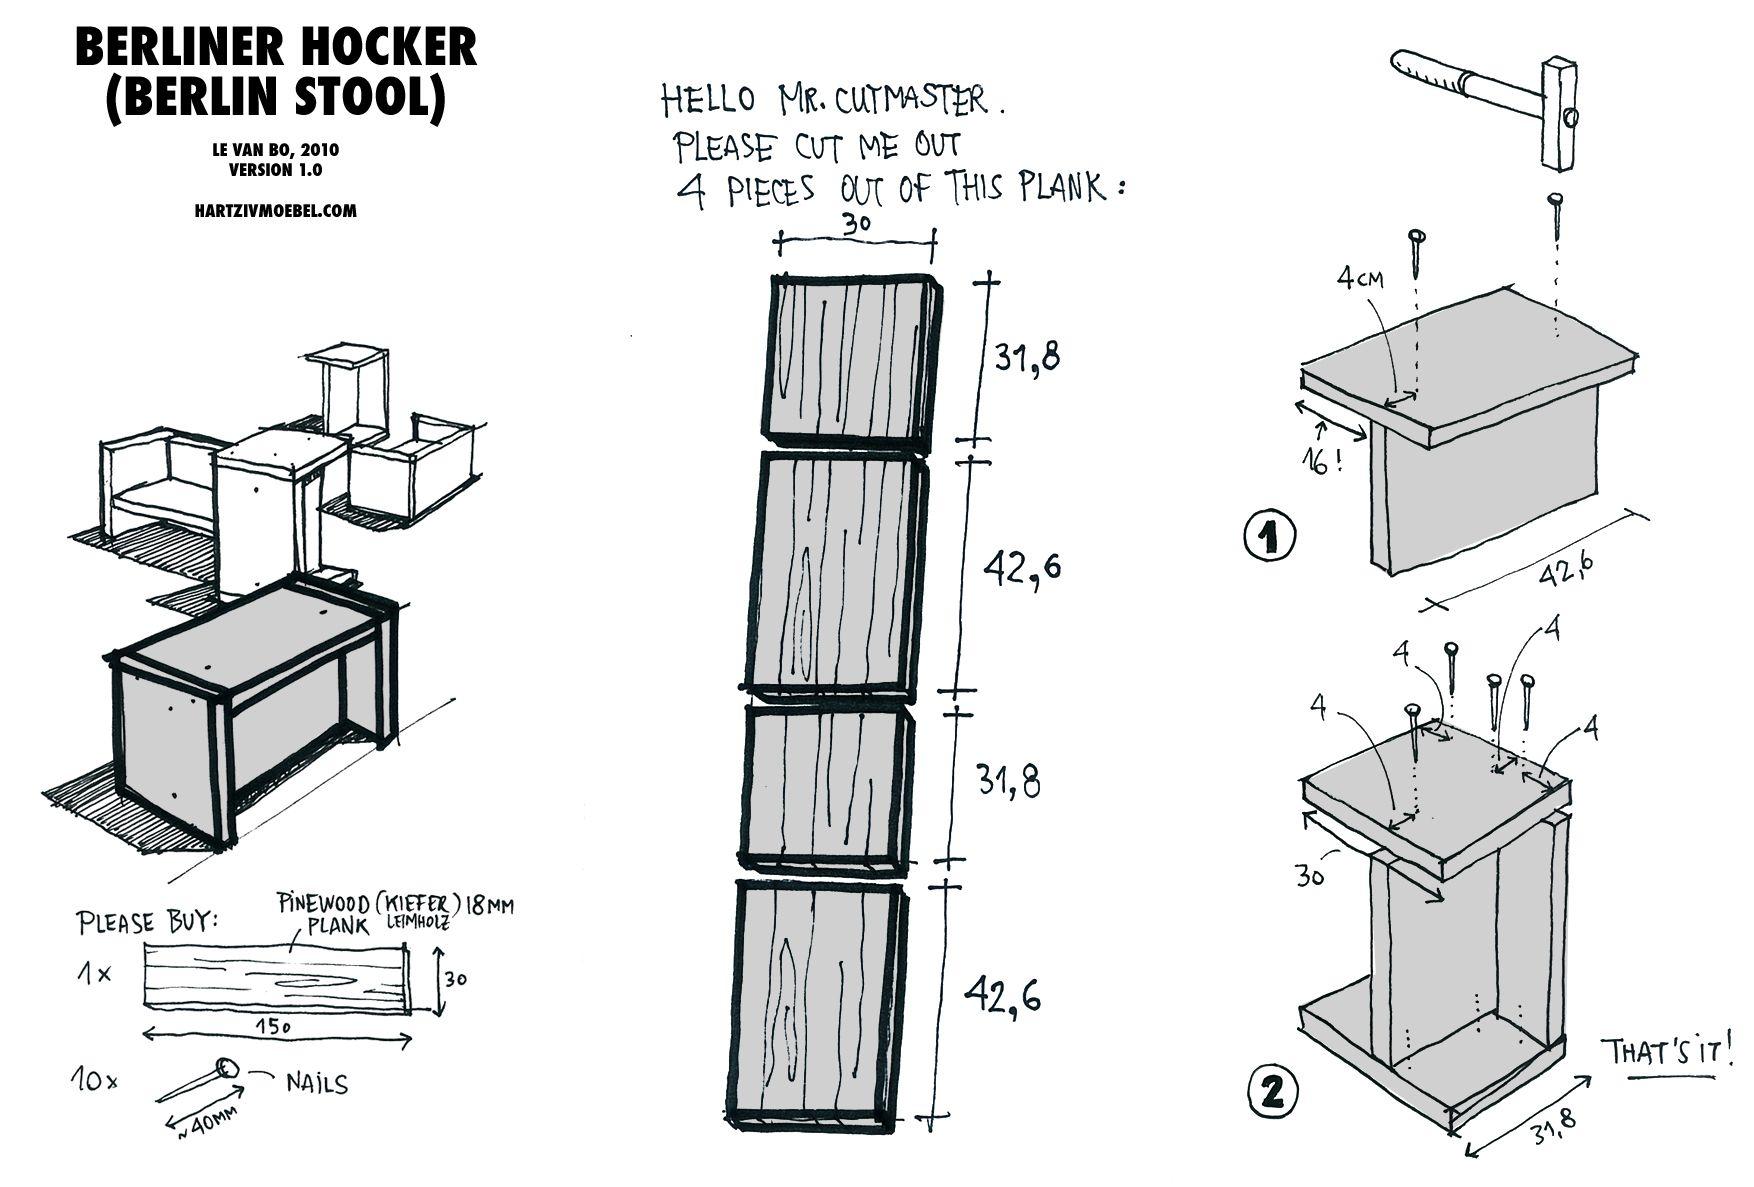 Berliner Hocker berliner hocker easy diy berlin stool stackable craft